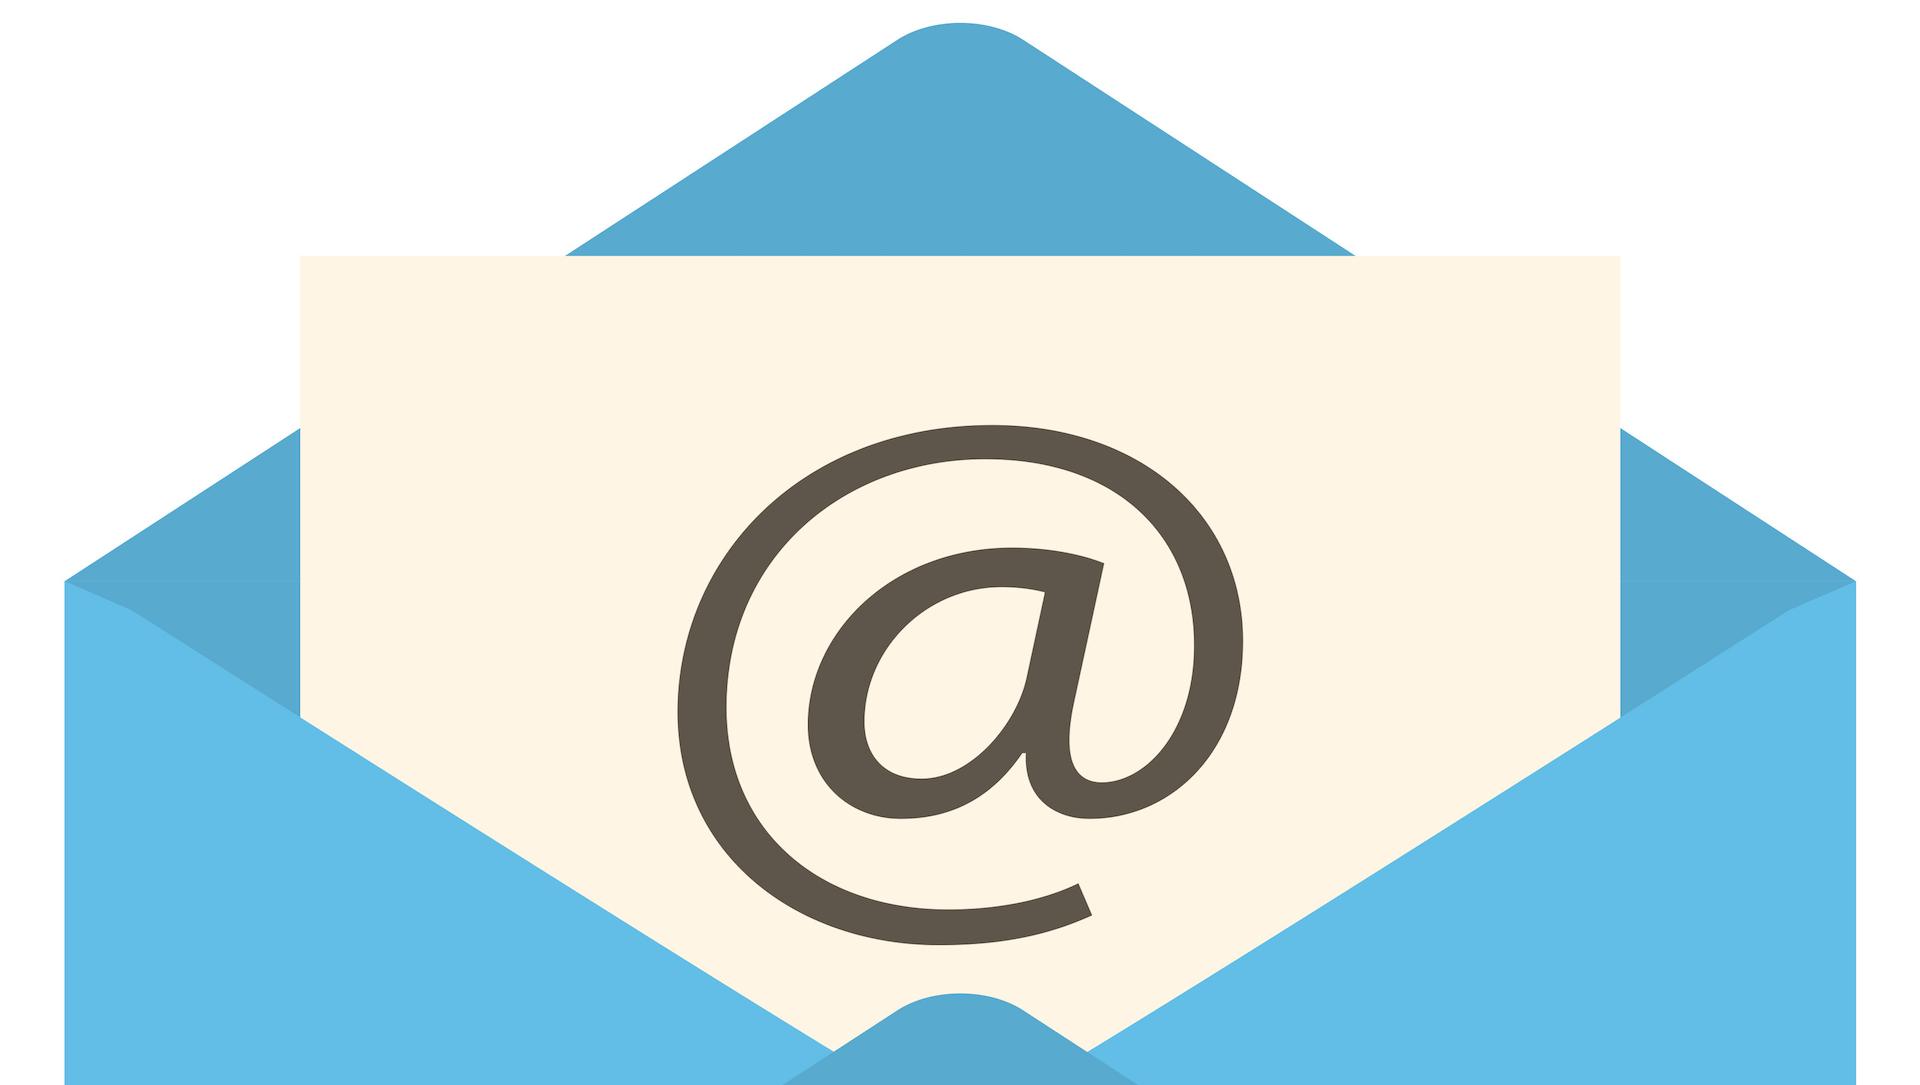 TinyPic - Free Image Hosting, Photo Sharing